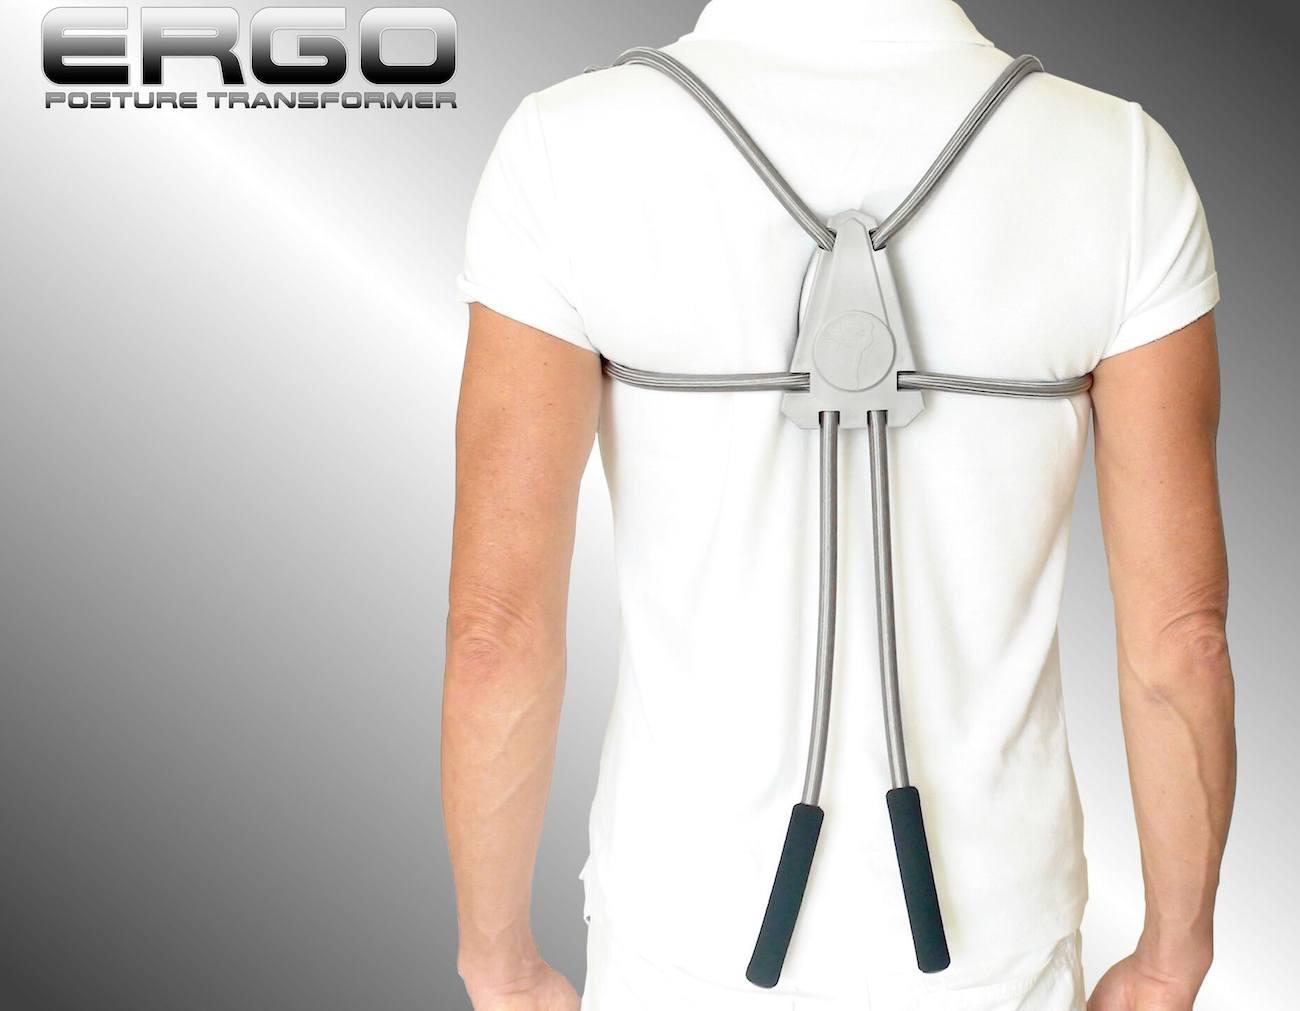 Image result for ergo posture